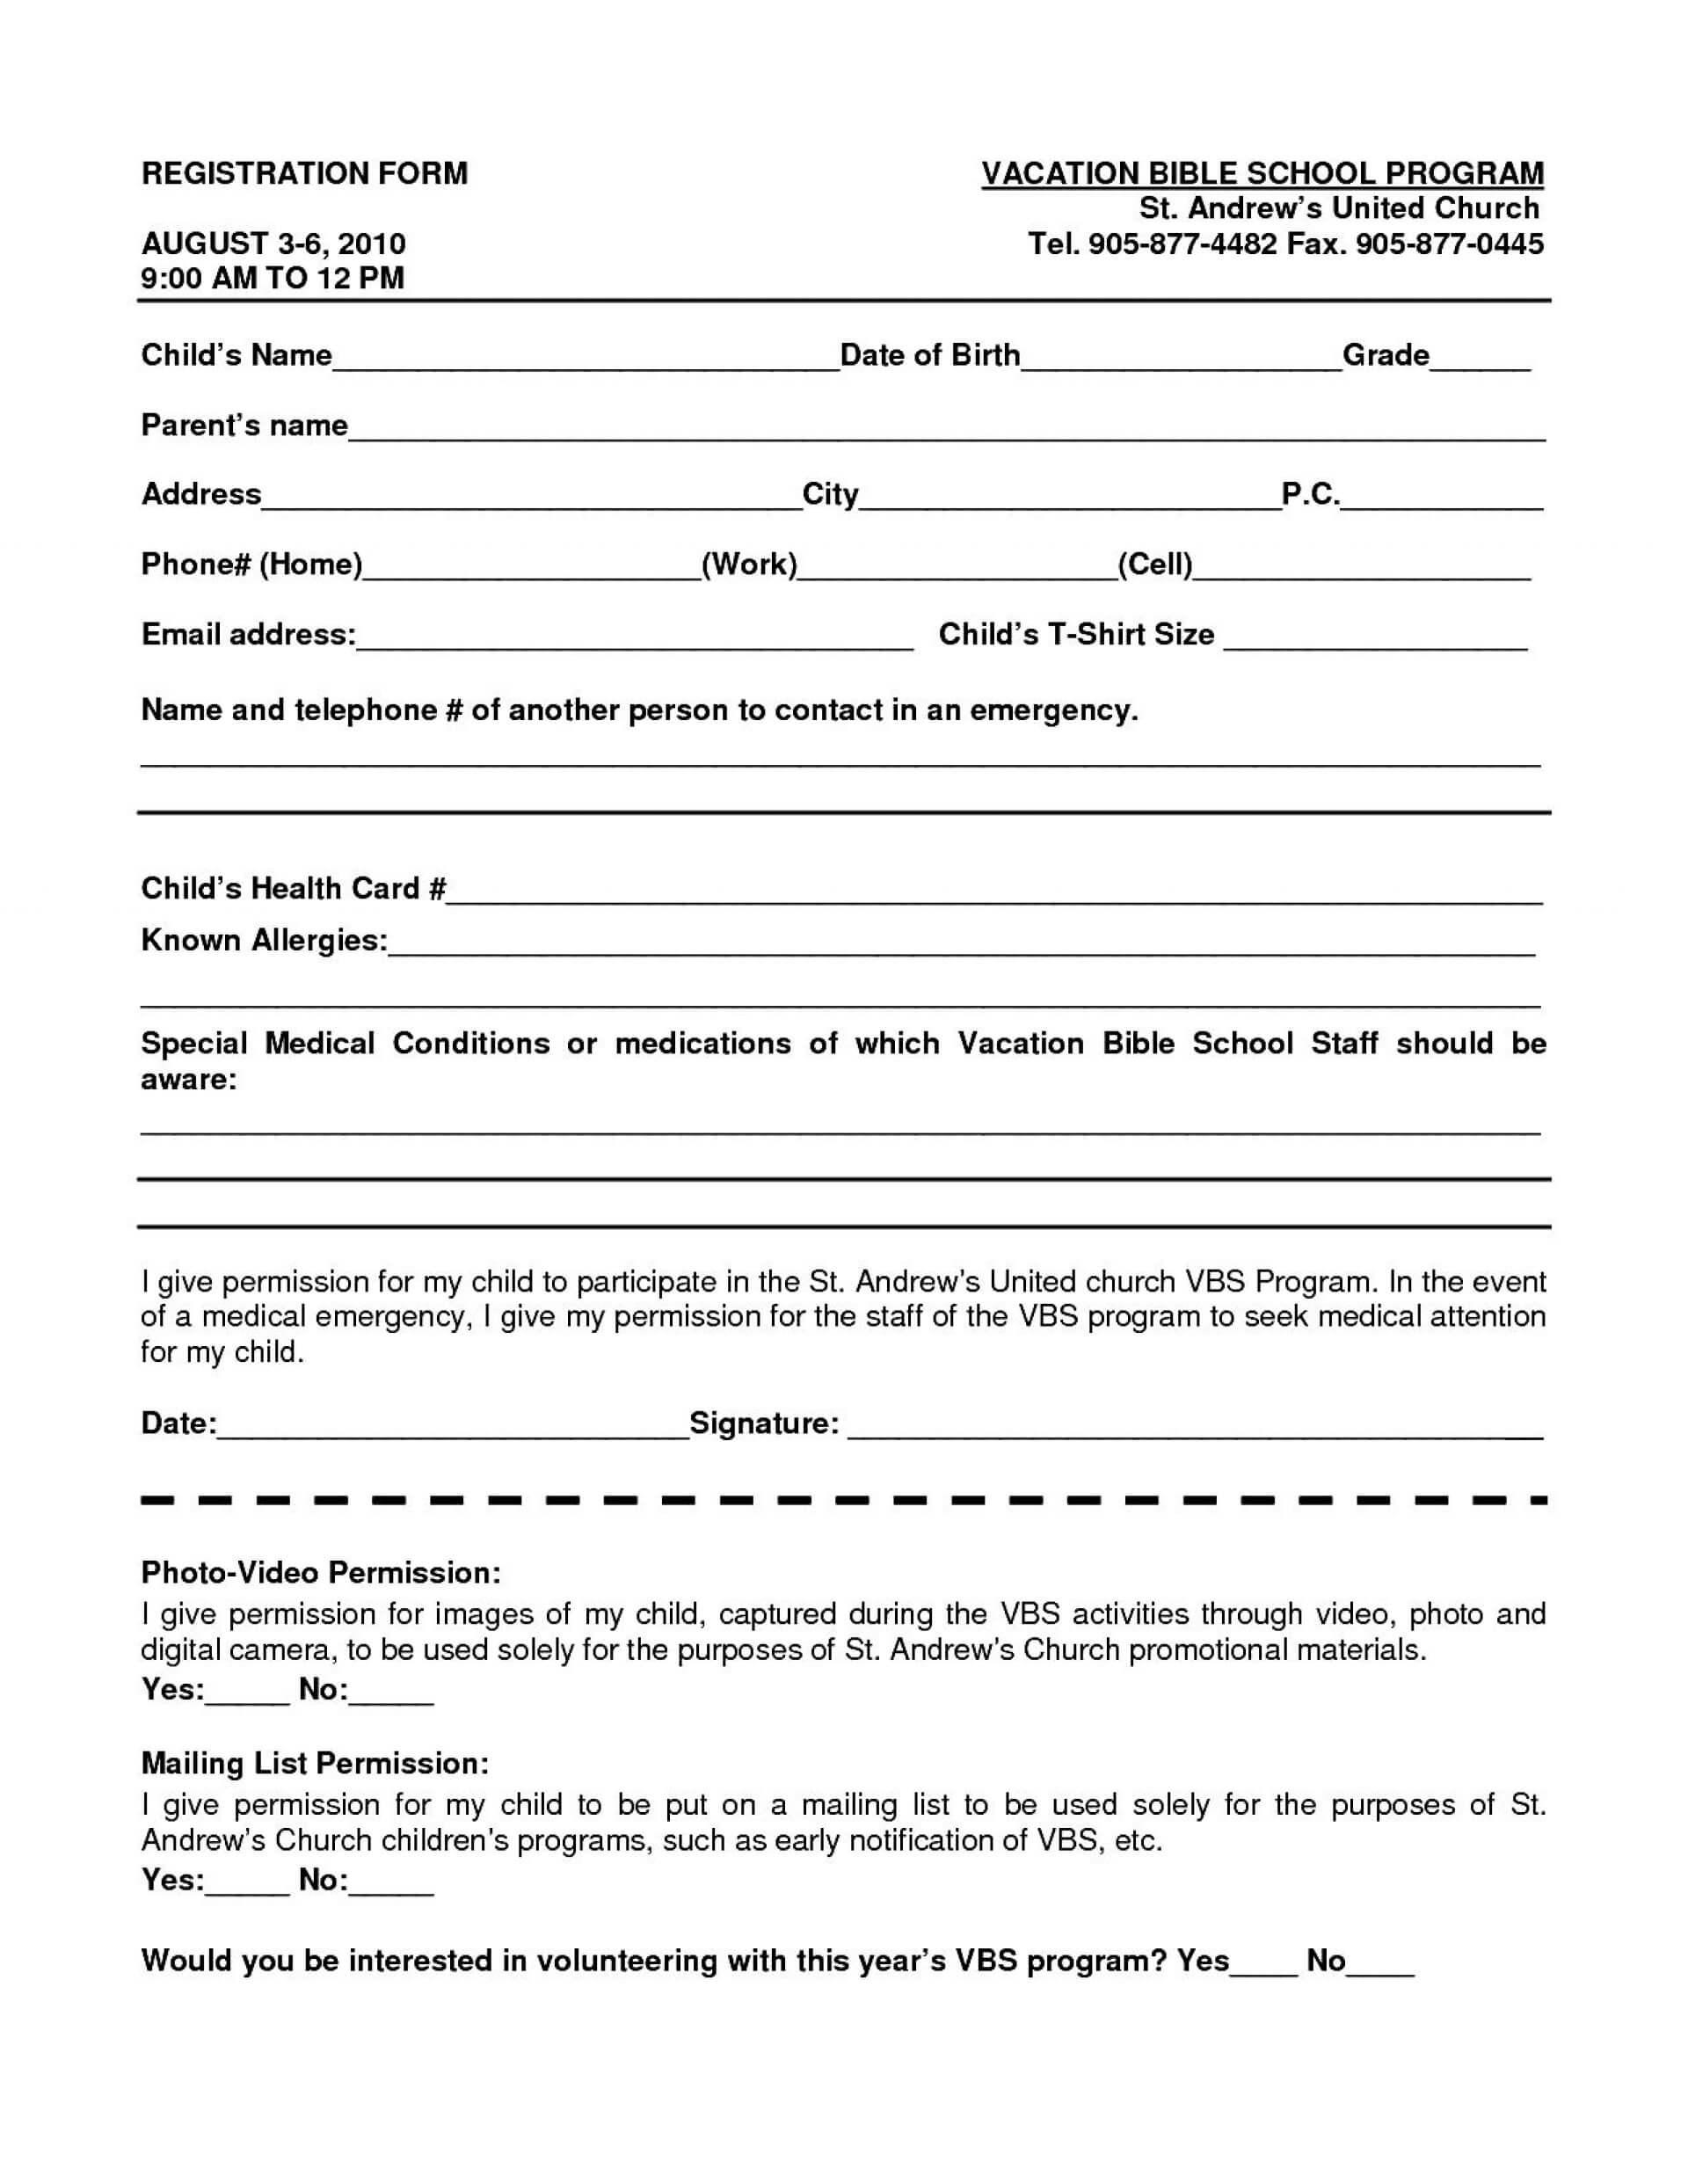 016 School Registration Form Template Word Ideas Free In With Regard To School Registration Form Template Word